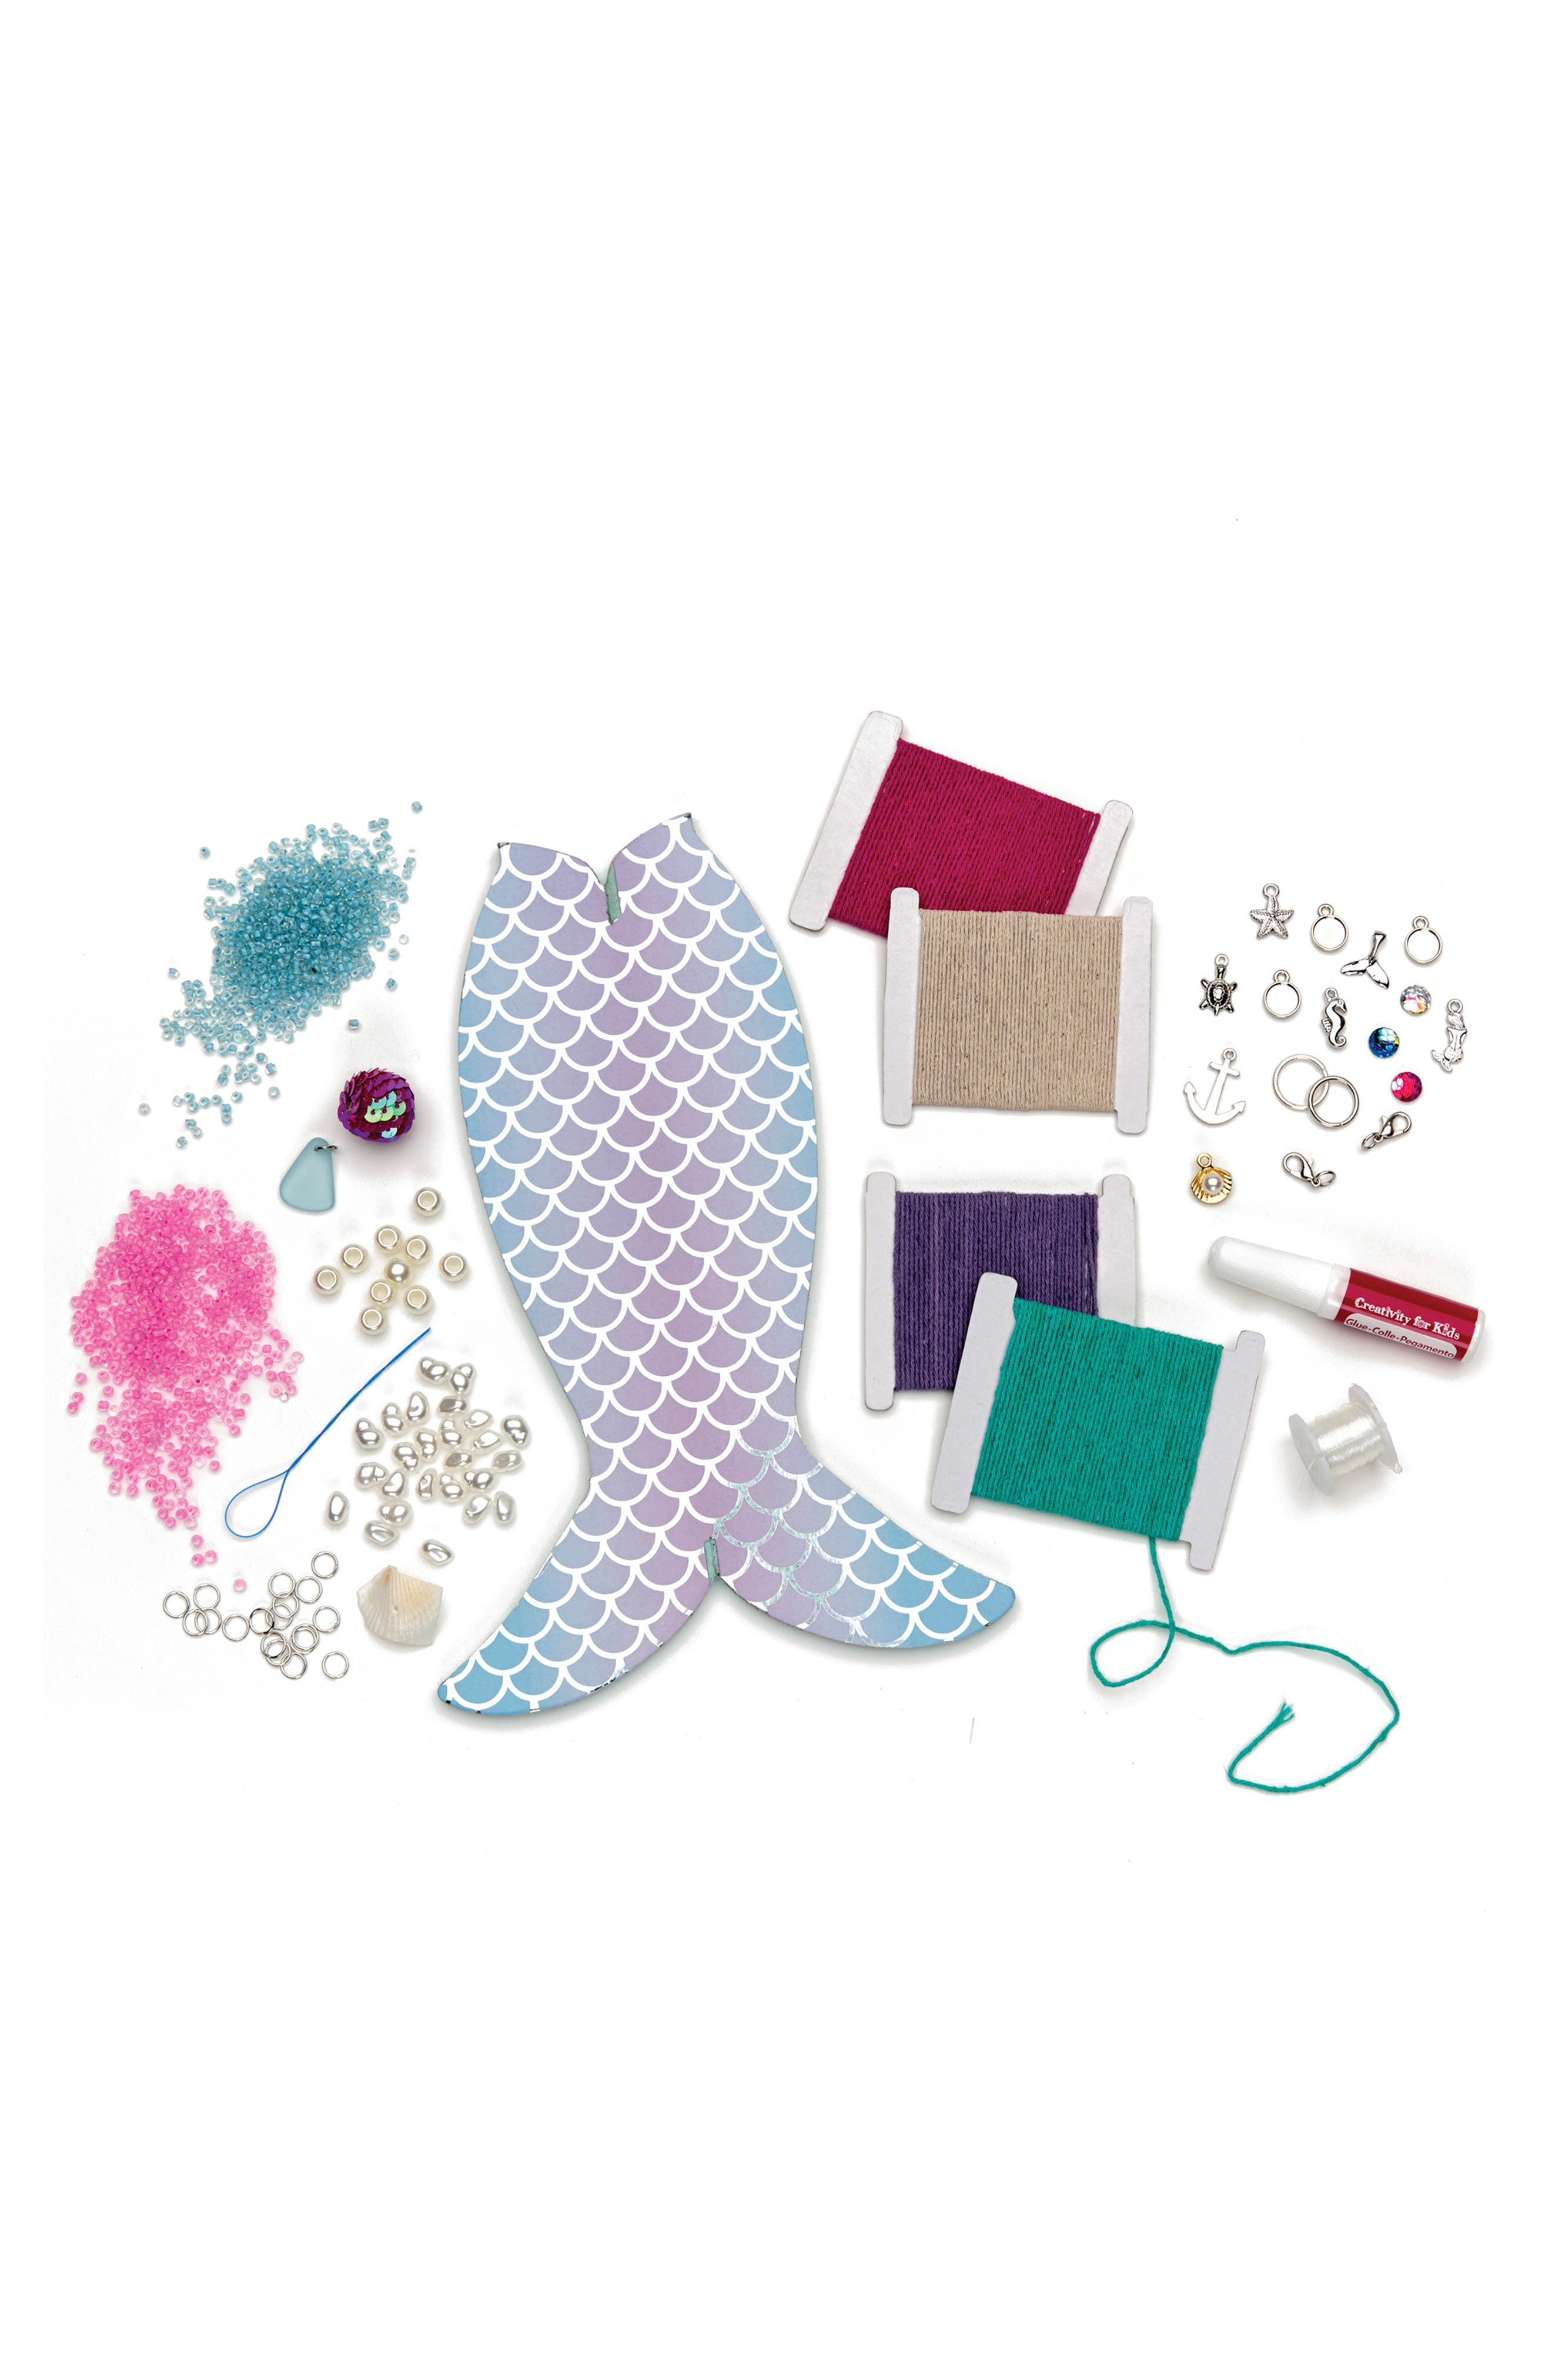 Mermaid Tail Jewelry Maker,                             Alternate thumbnail 3, color,                             450